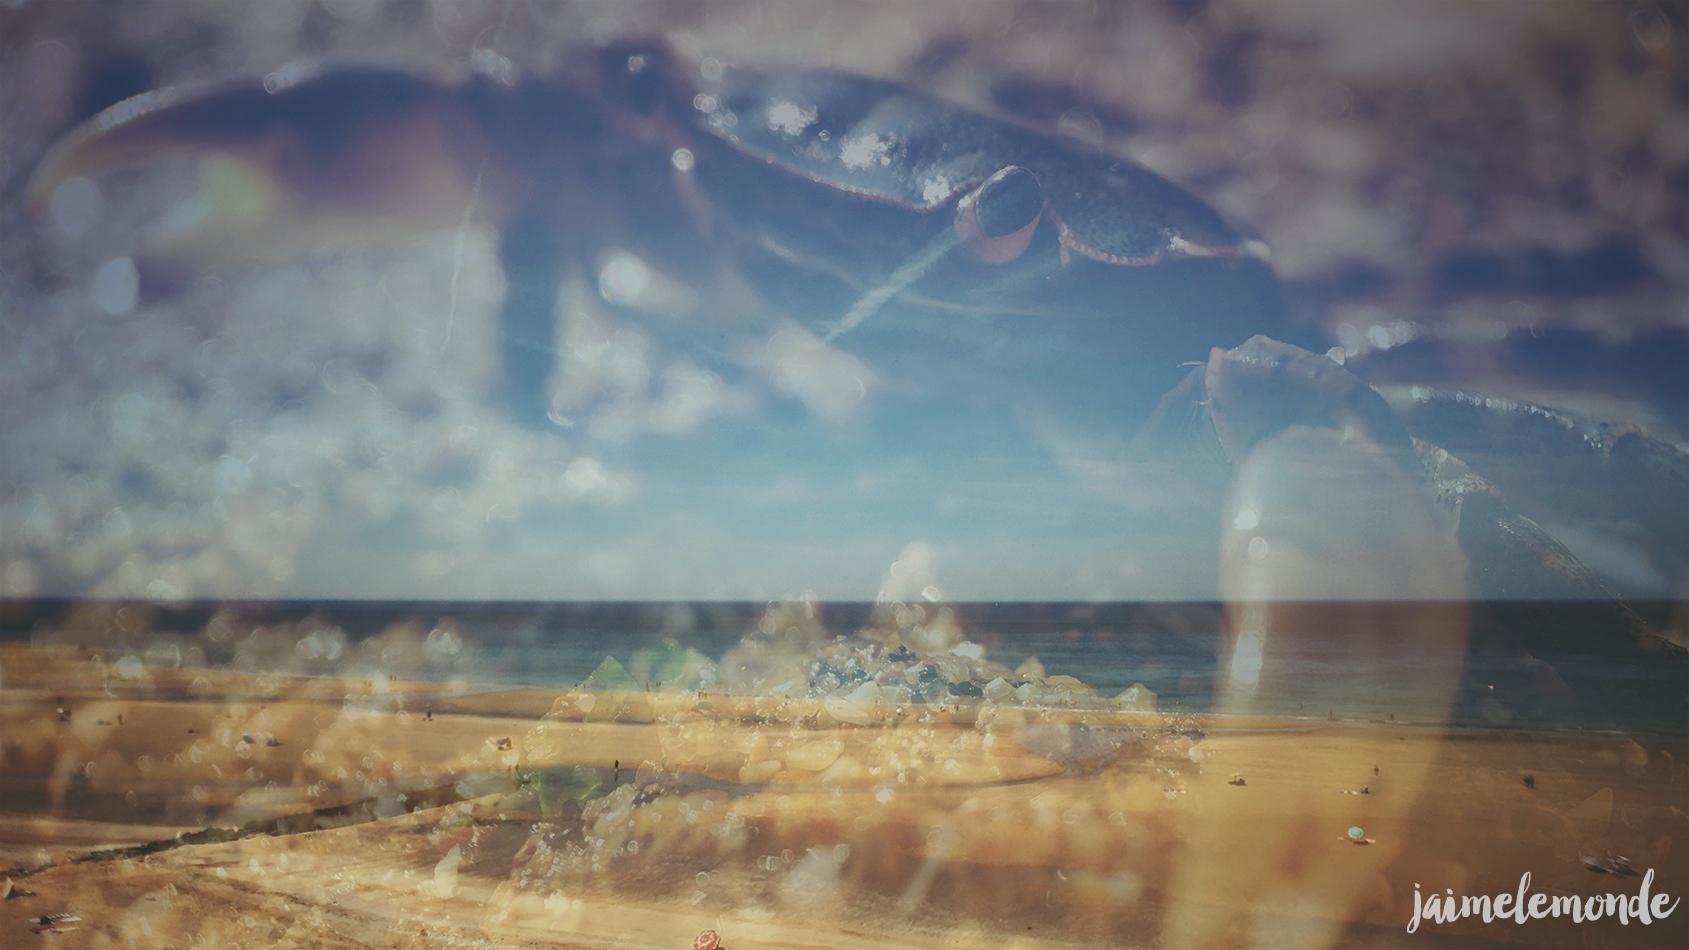 Pixter - Double exposition Snapseed - Blonville sur mer - ©jaimelemonde (7)